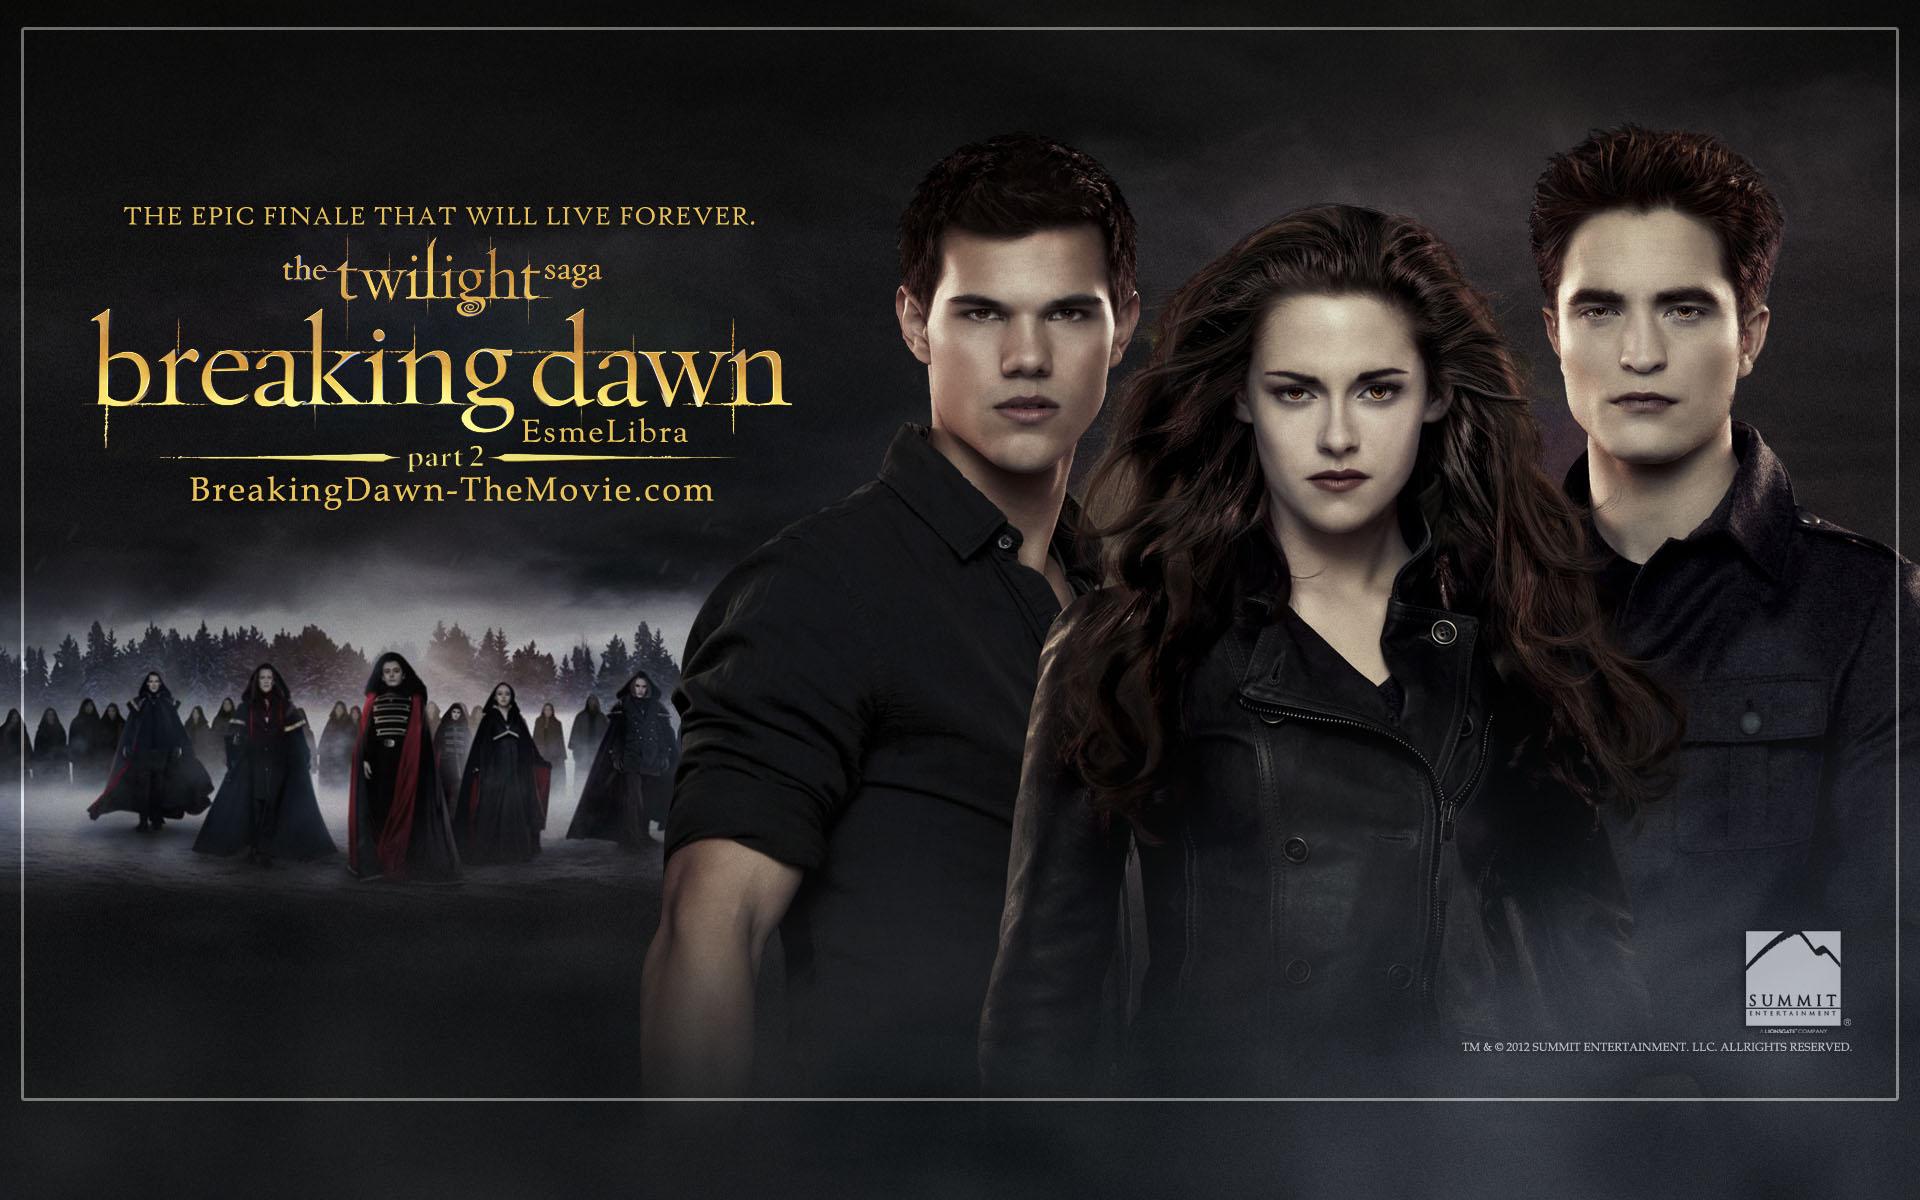 Twilight Saga Breaking Dawn Part Wallpapers WallpaperPulse